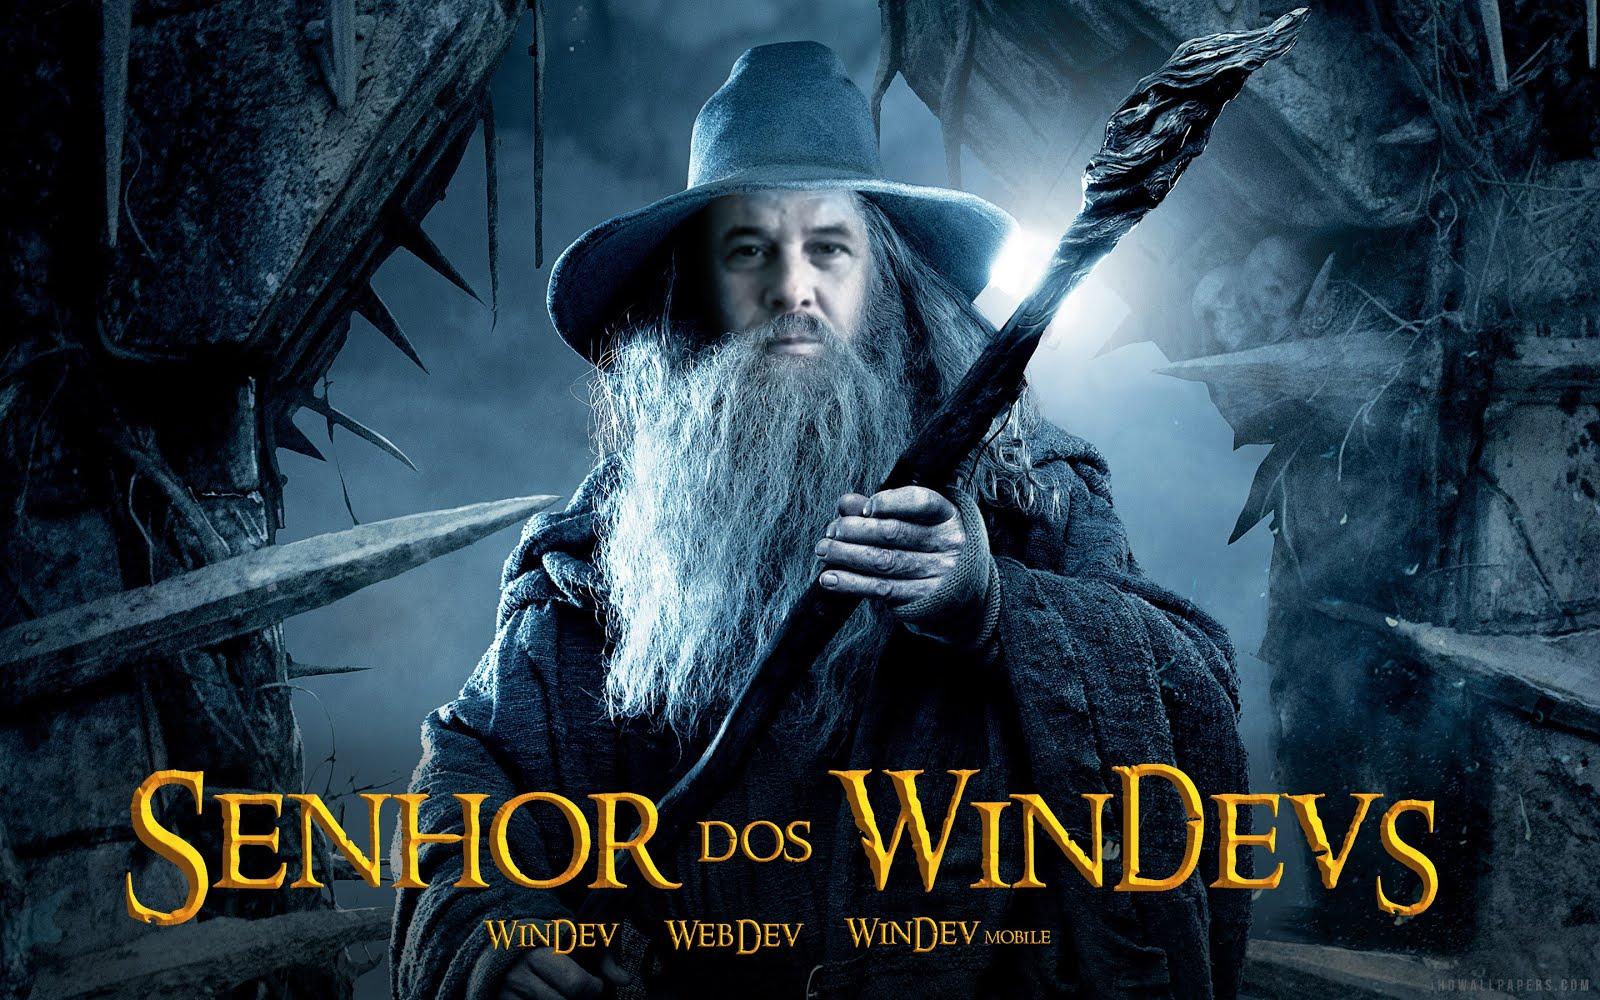 Senhor dos Windevs